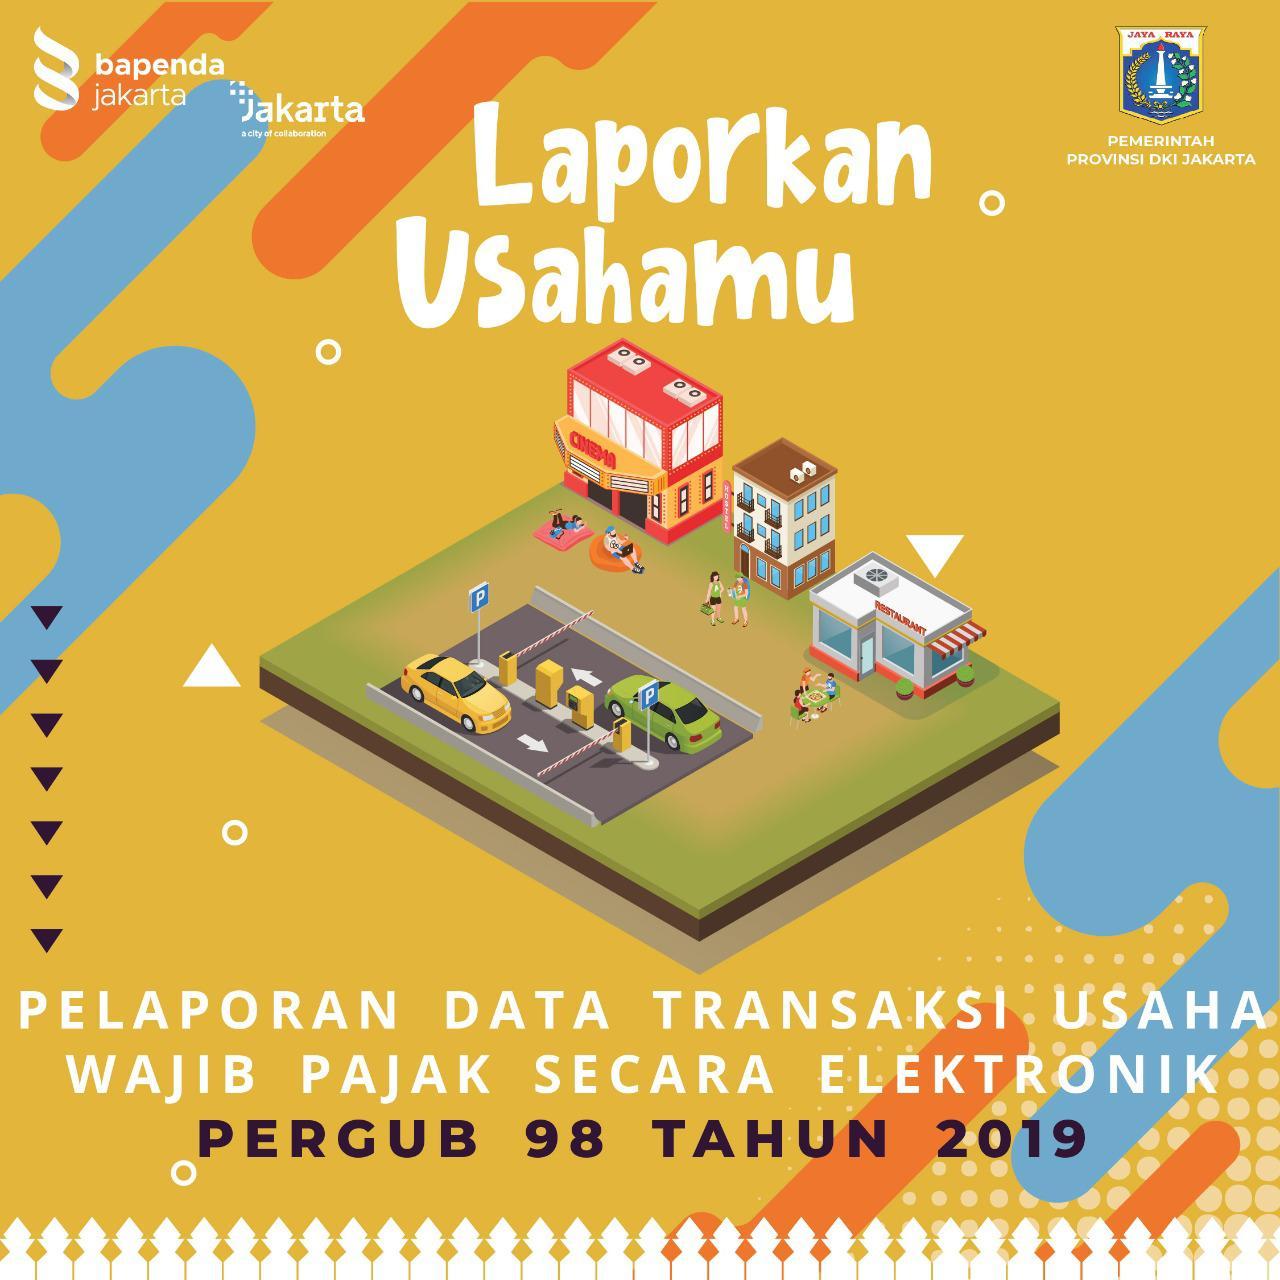 Pelaporan Data Transaksi Usaha Wajib Pajak Secara Elektronik